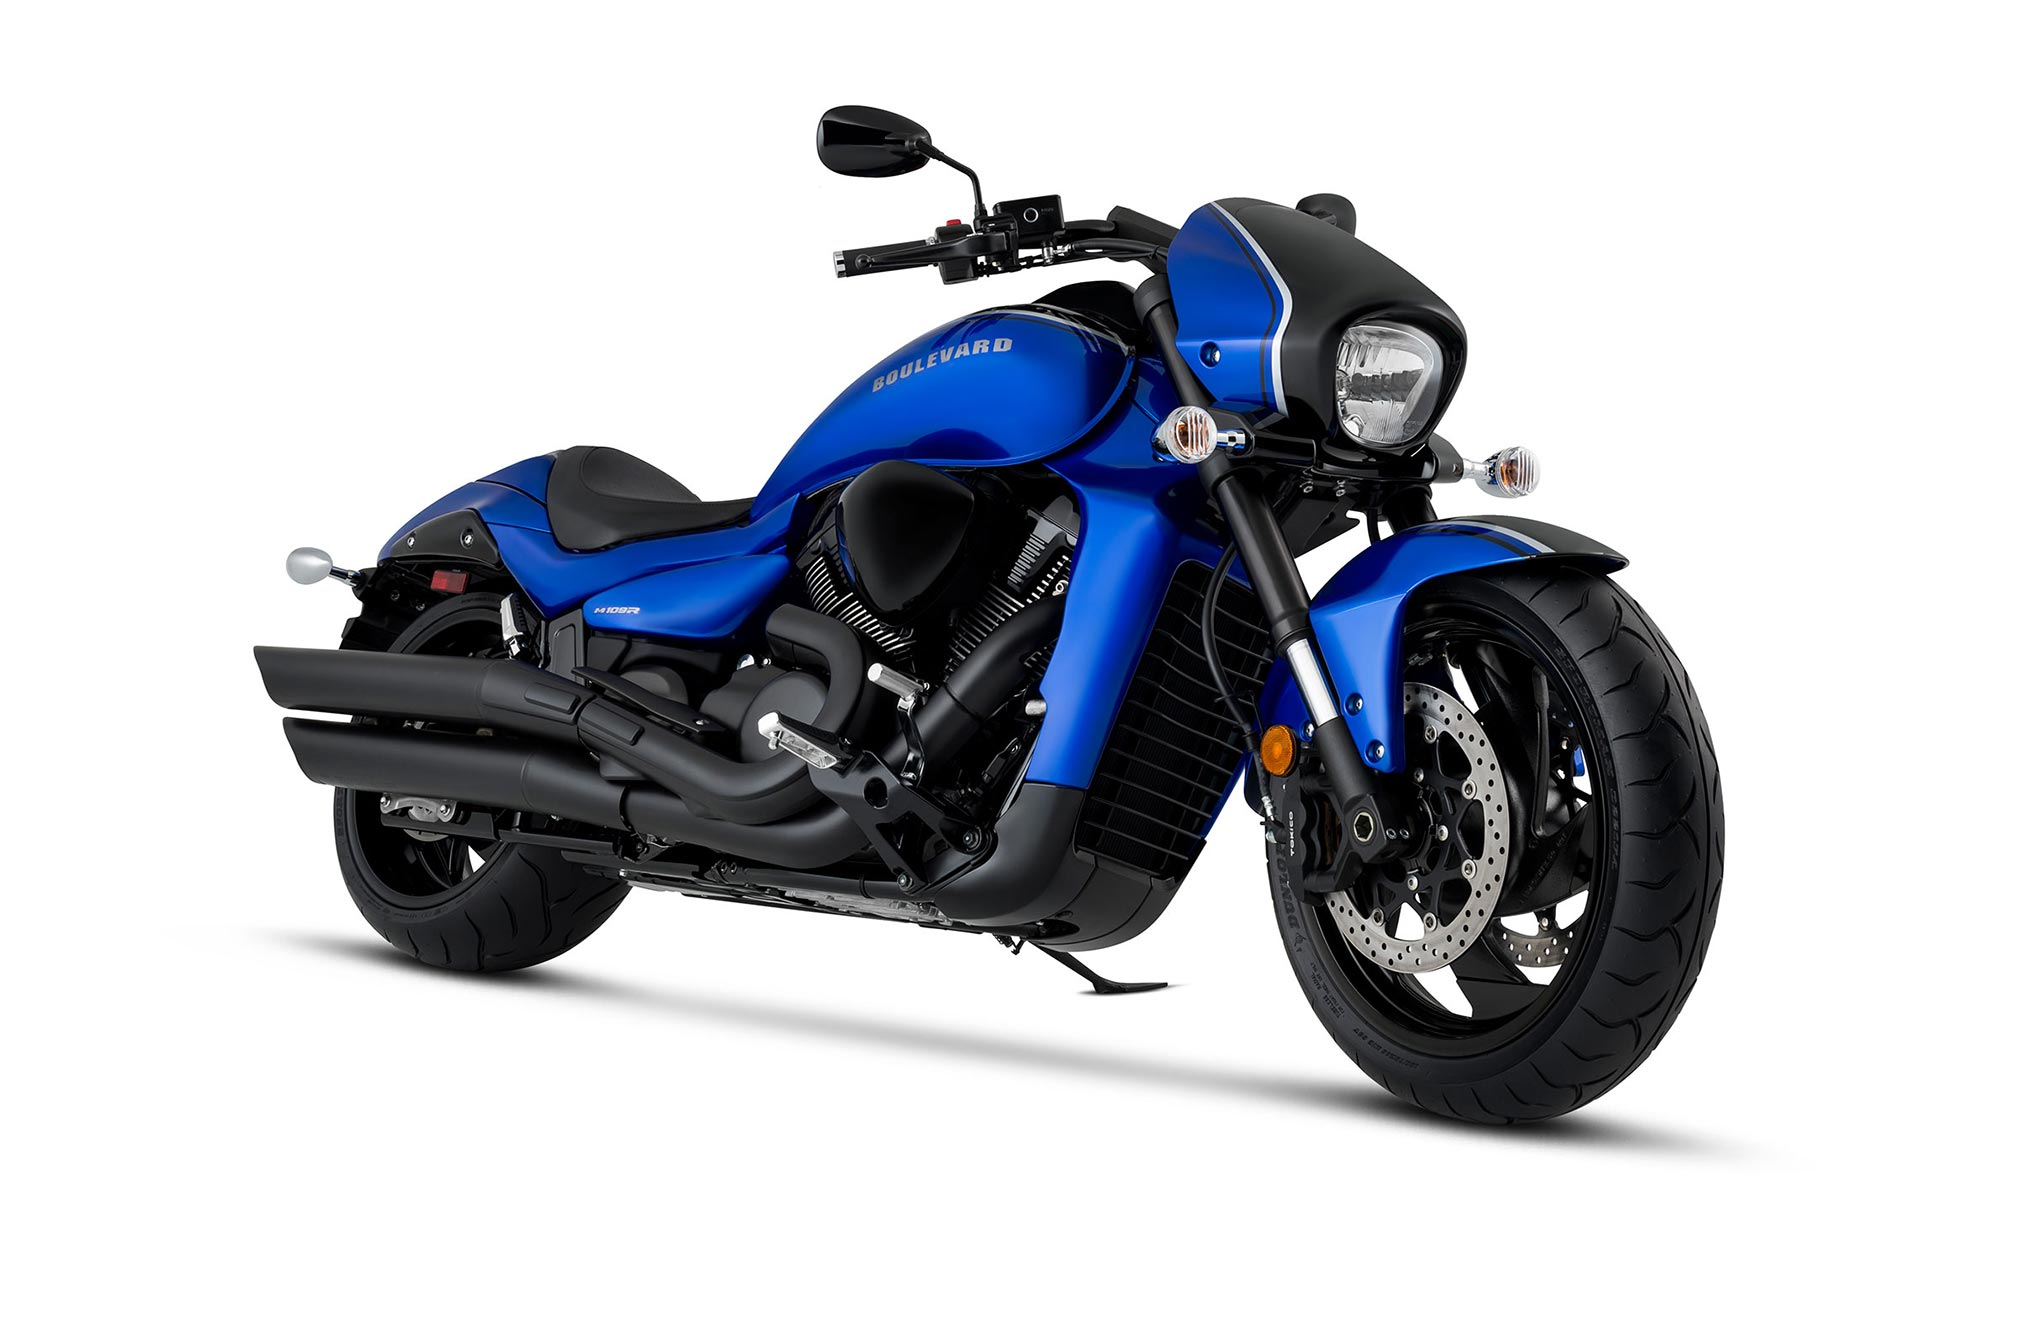 Suzuki Motorcycle Parts From Predator Motorsport Gt750 Wiring Diagram 1 Products Boulevard M109r Boss